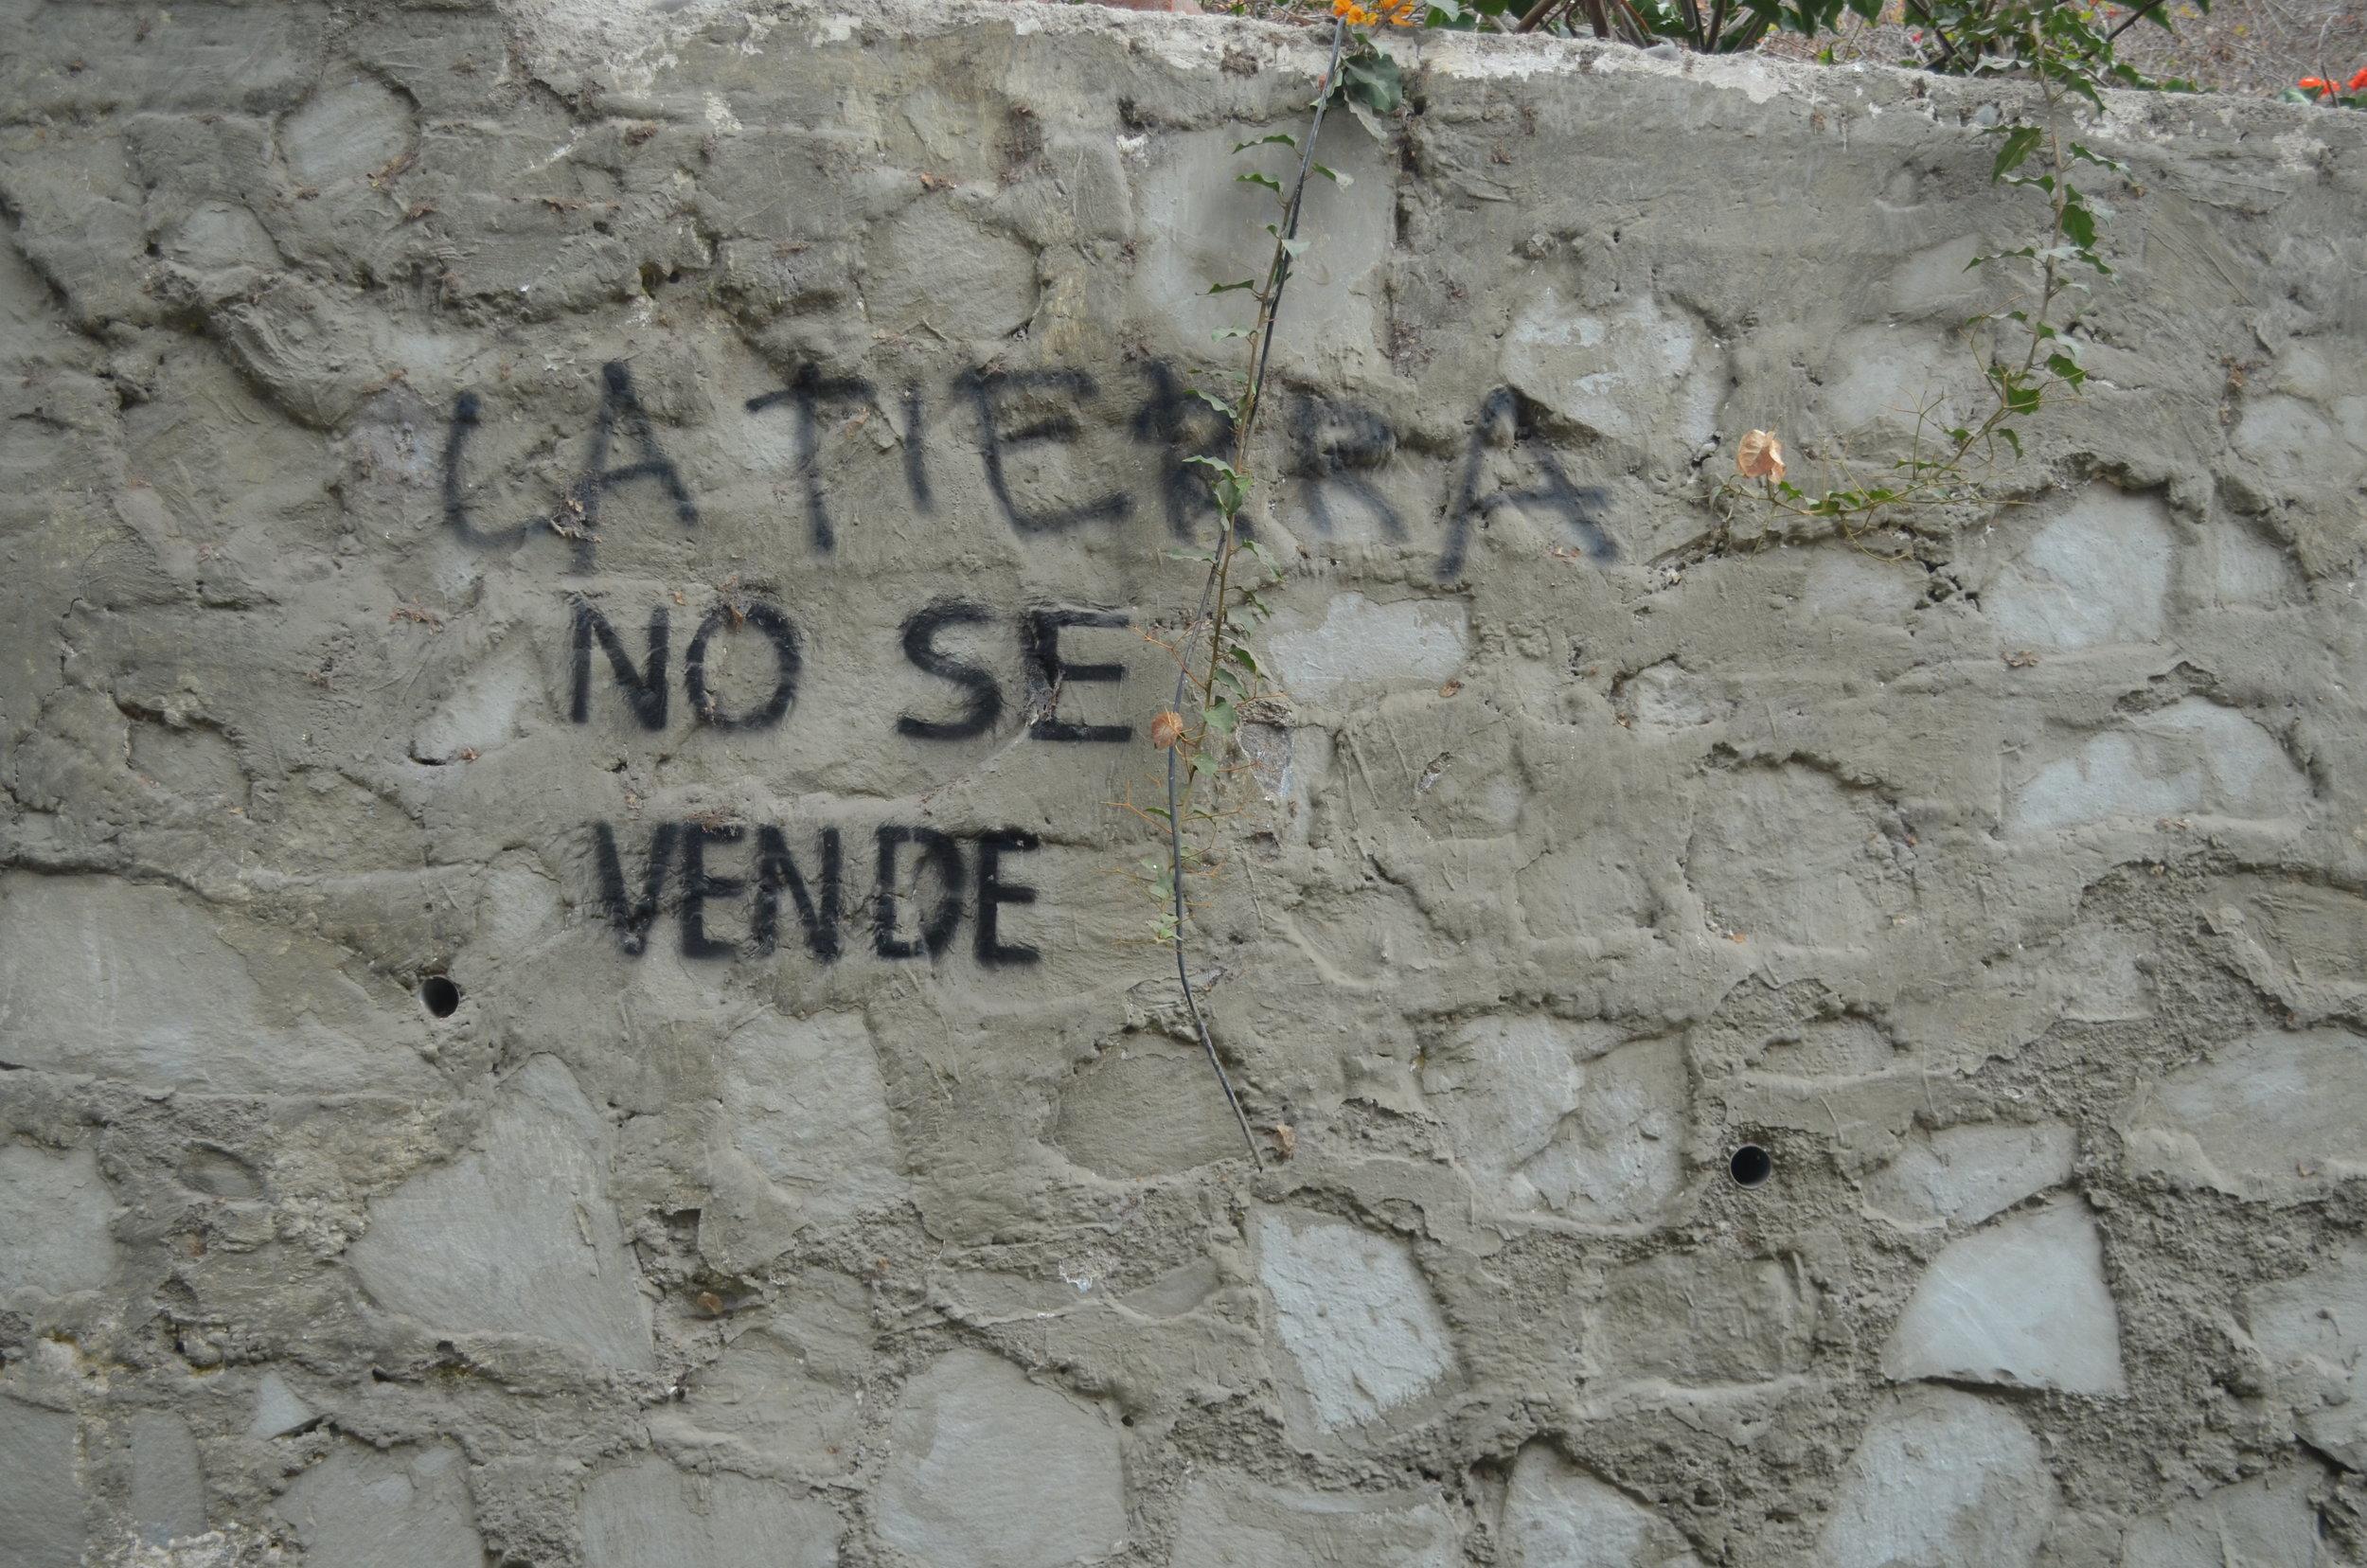 Barranco_22.jpg